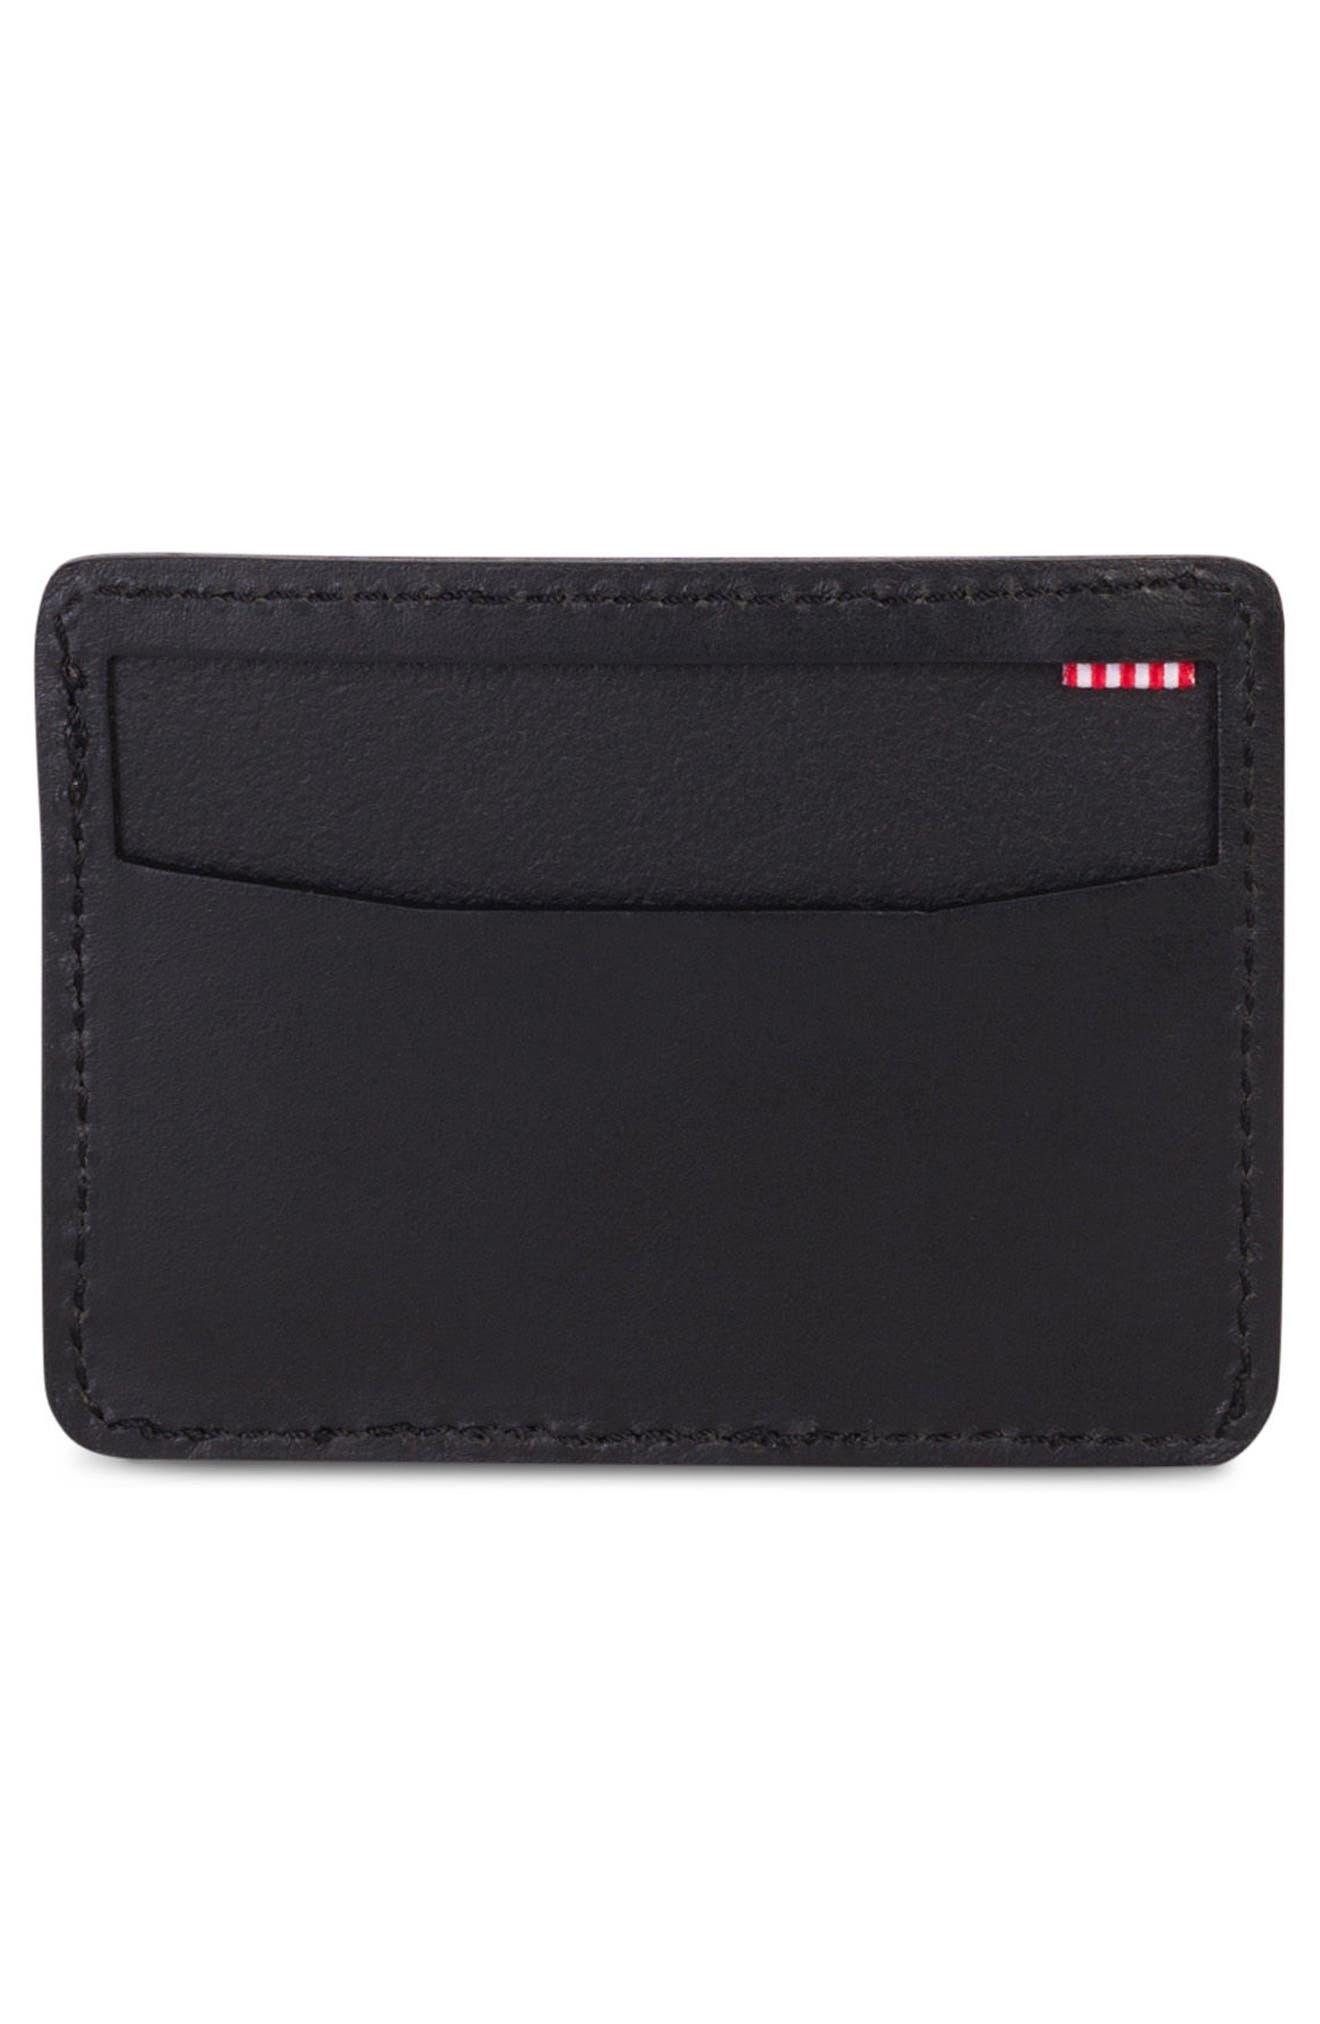 Ace Leather Card Case,                             Alternate thumbnail 2, color,                             001